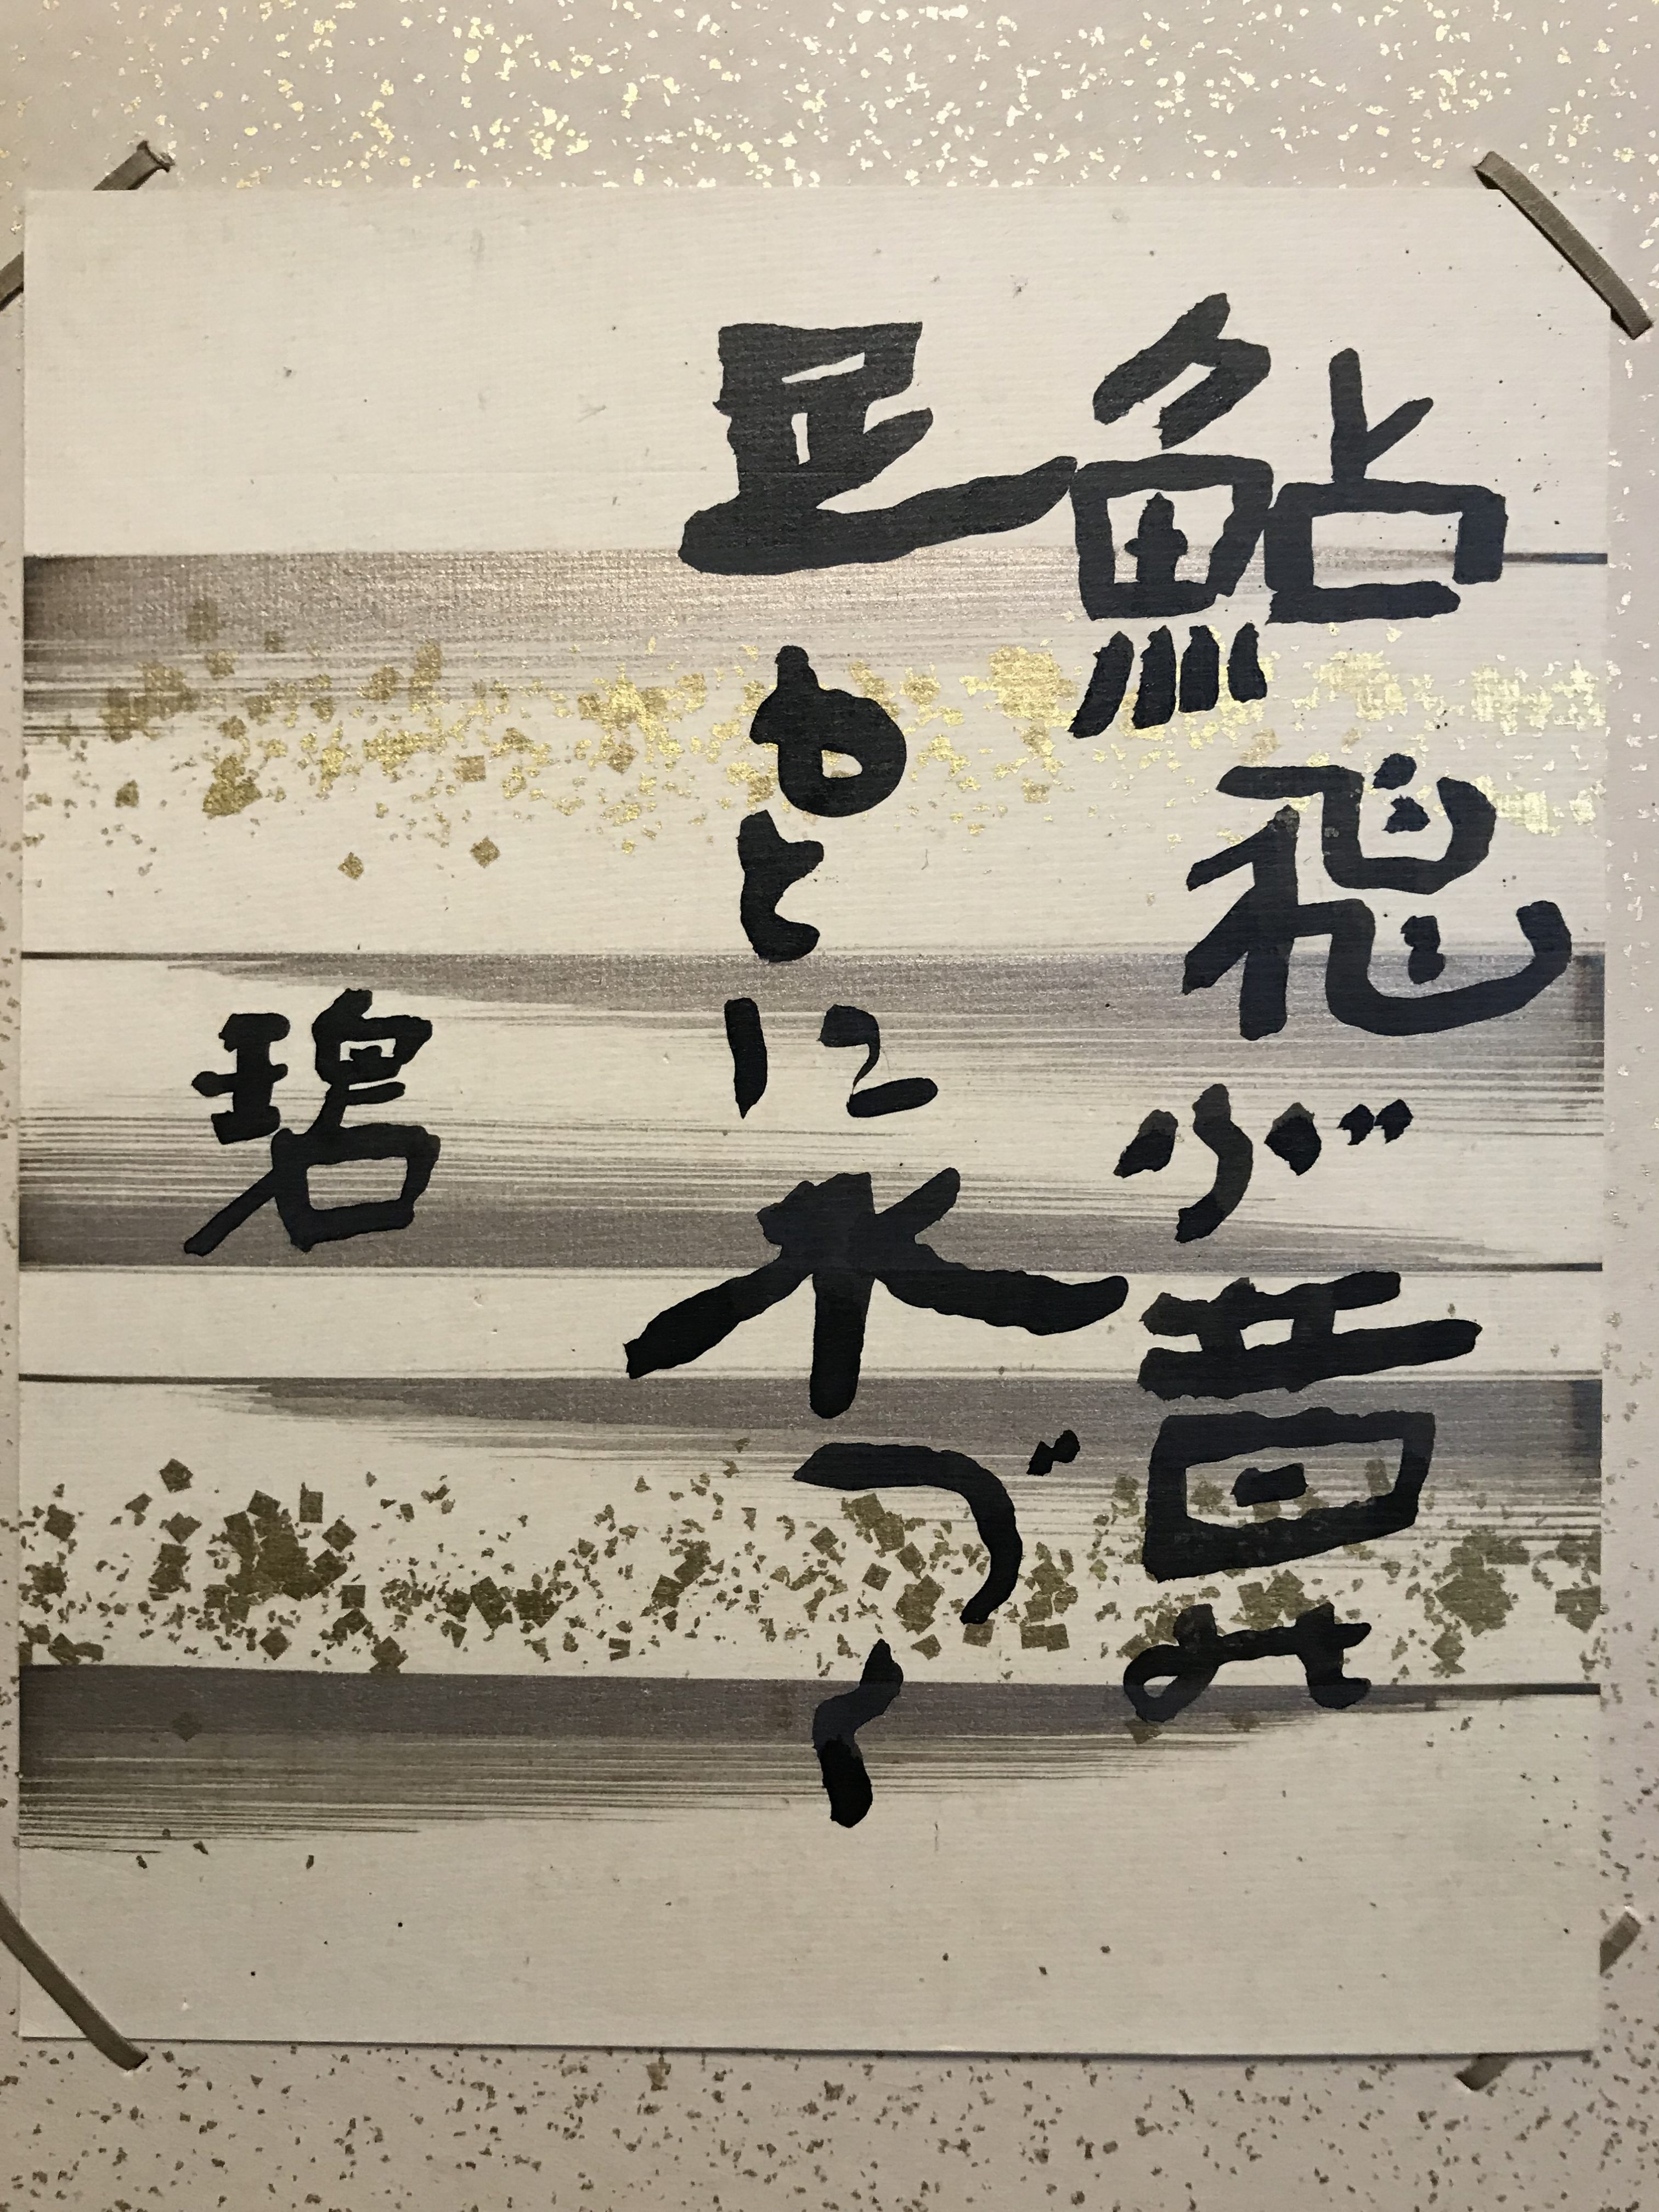 鮎飛ぶ自由律俳句